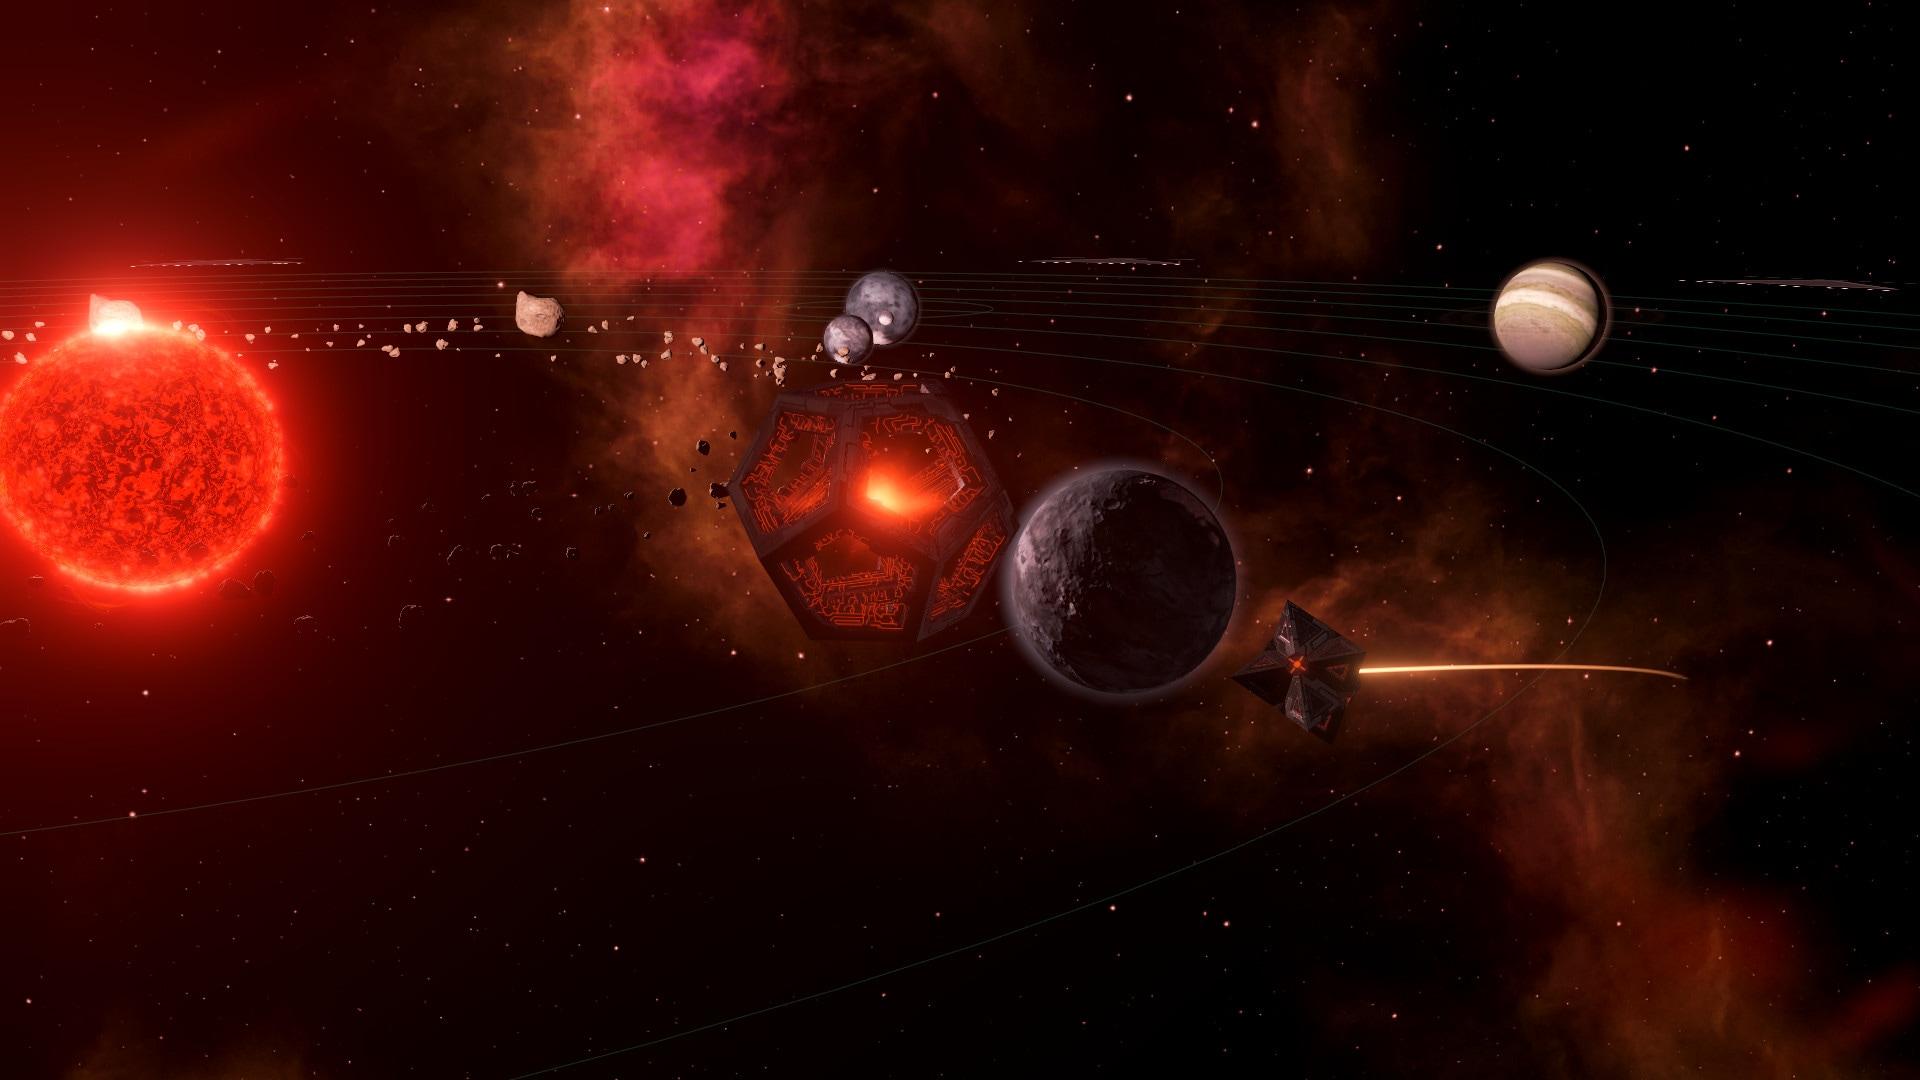 Stellaris: Synthetic Dawn Story Pack PC Steam Key GLOBAL - 2